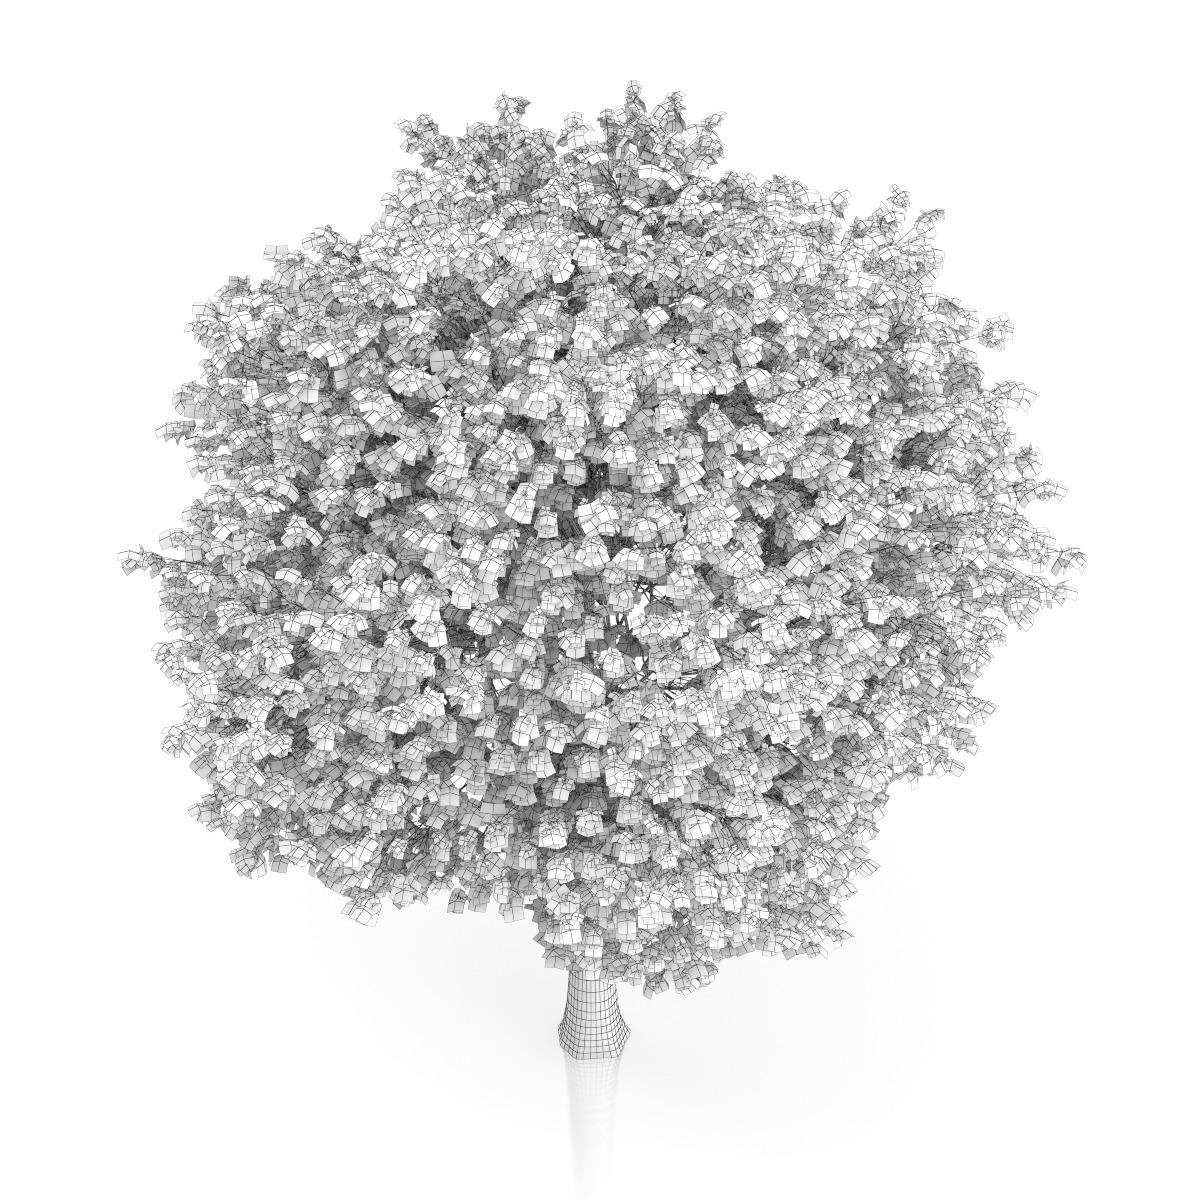 Roofing Concepts Ri London Plane Tree (Platanus × acerifolia) 13.4m by CGAxis ...